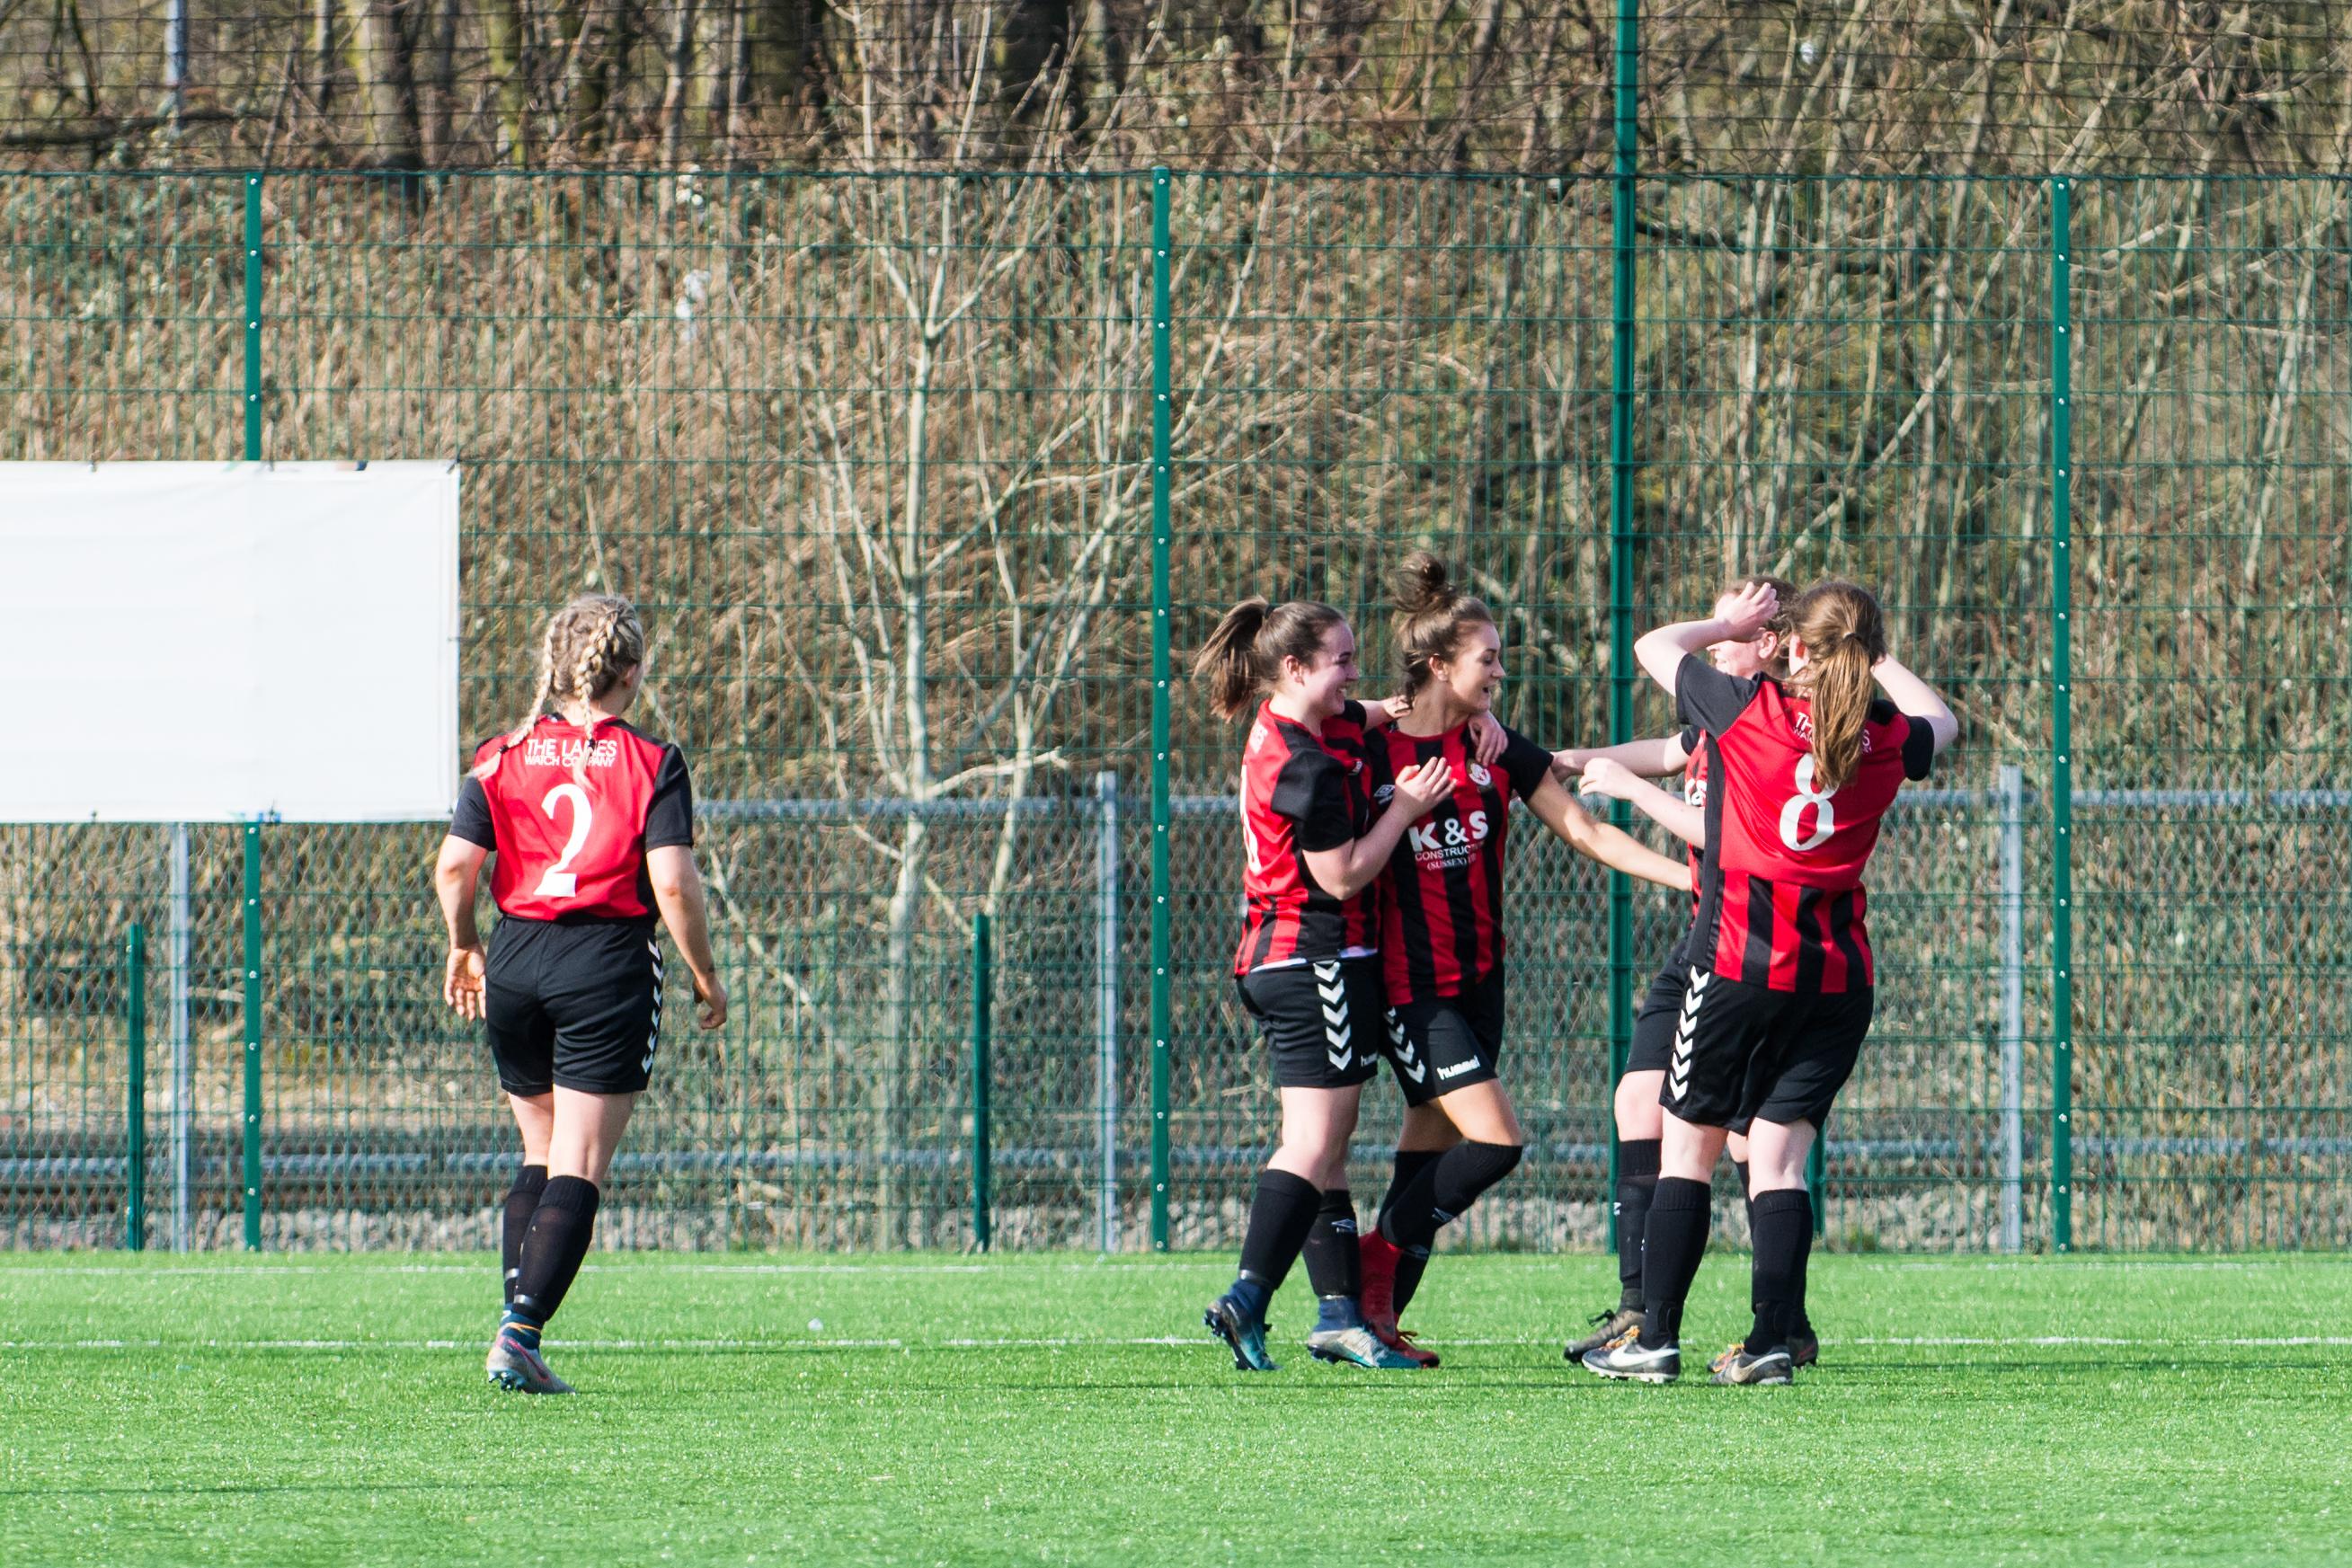 DAVID_JEFFERY Saltdean Utd Ladies FC vs Worthing Utd Ladies FC 11.03.18 30